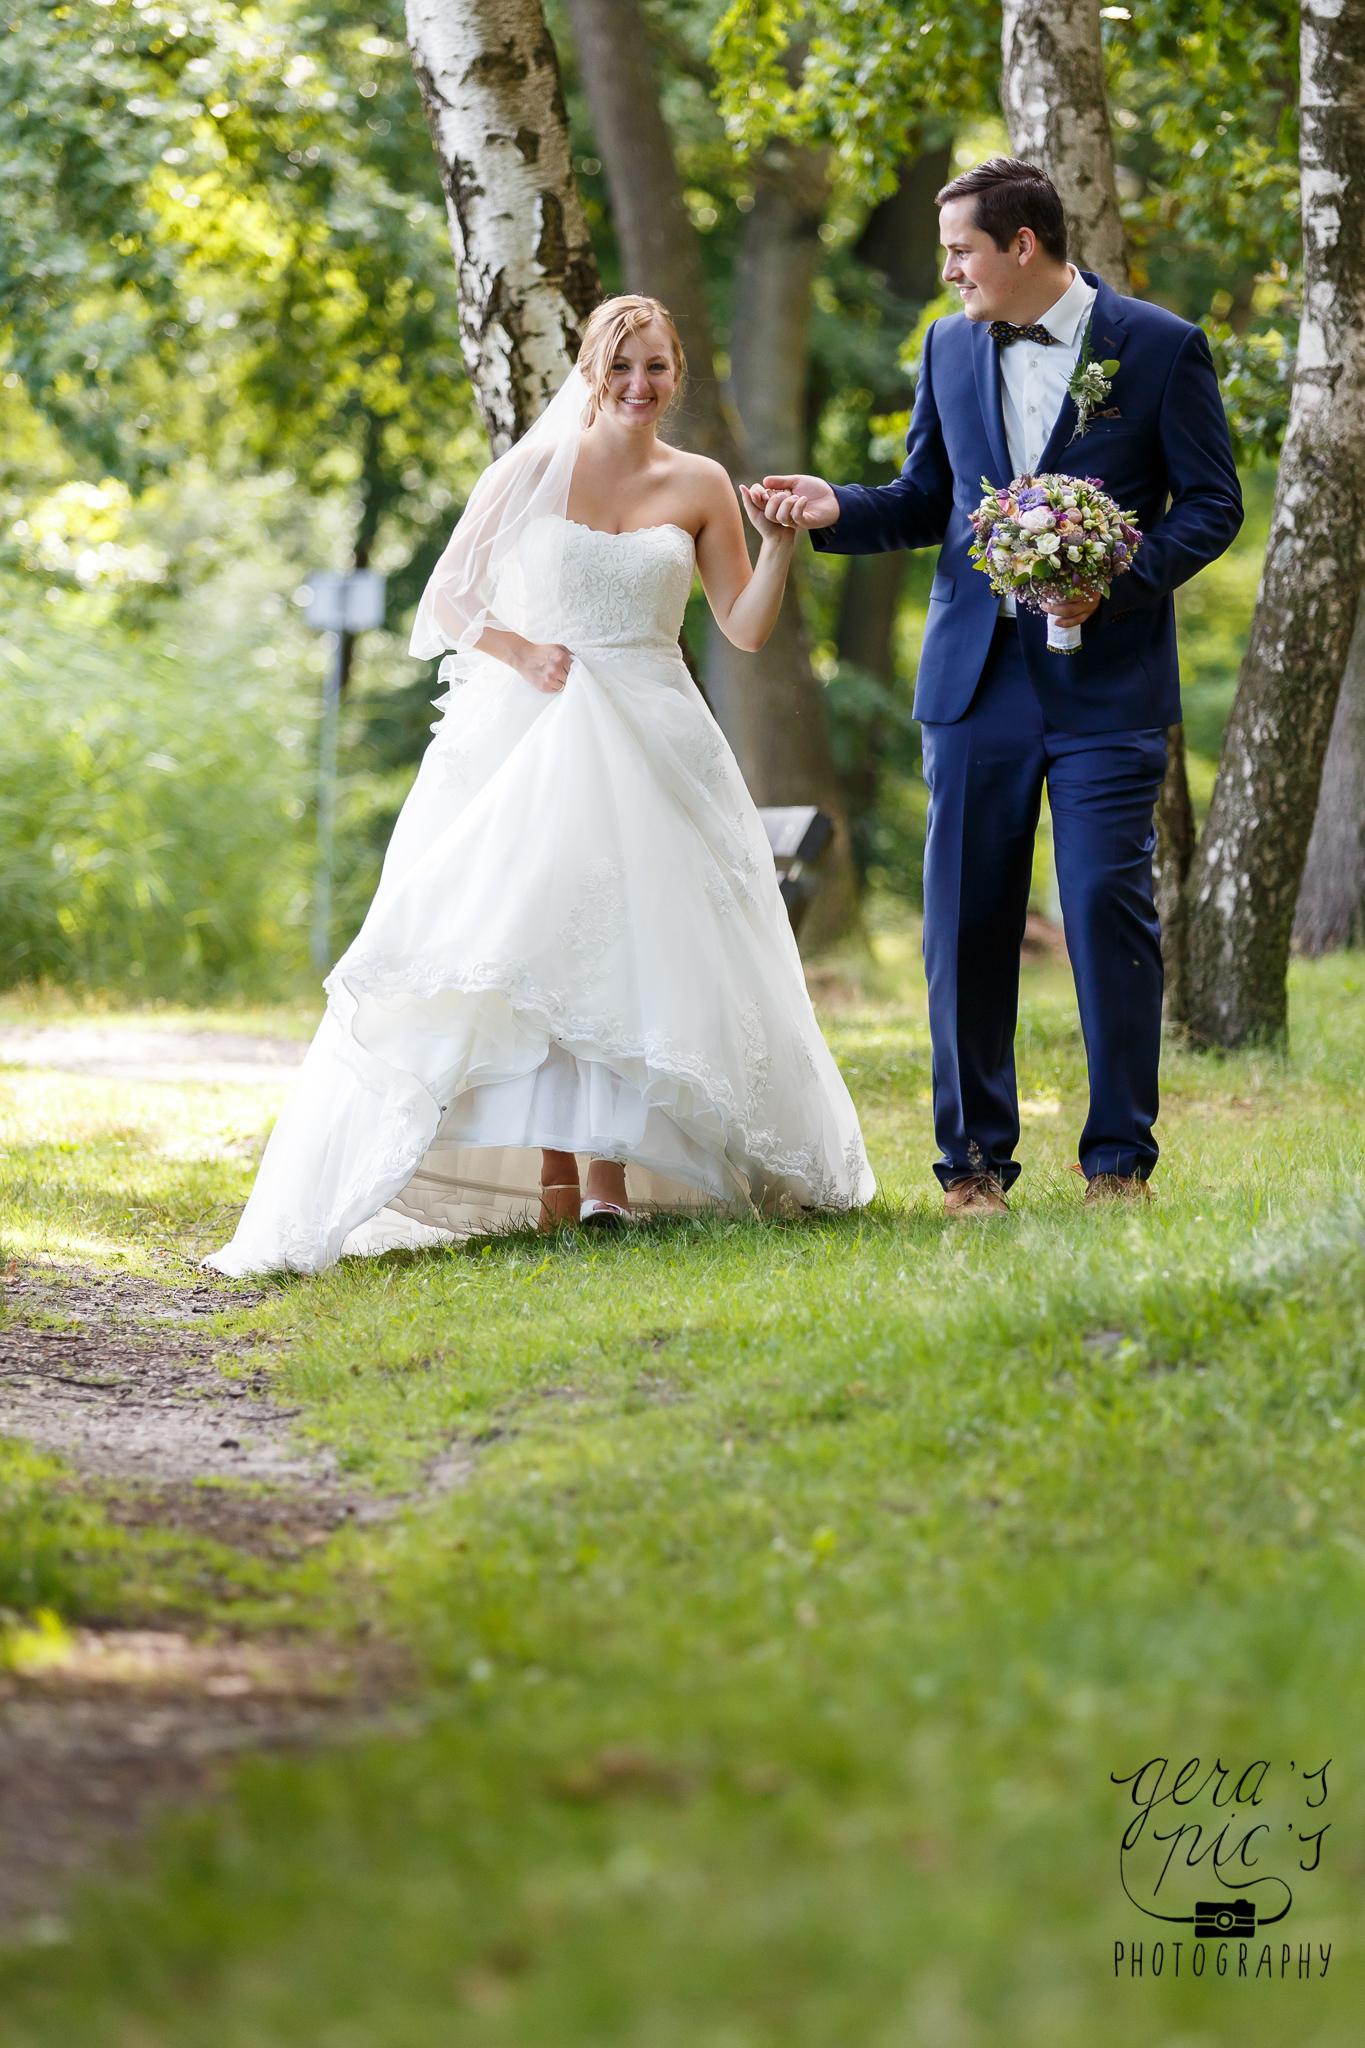 bruiloftsfotografie Gera's Pic's Photography-48